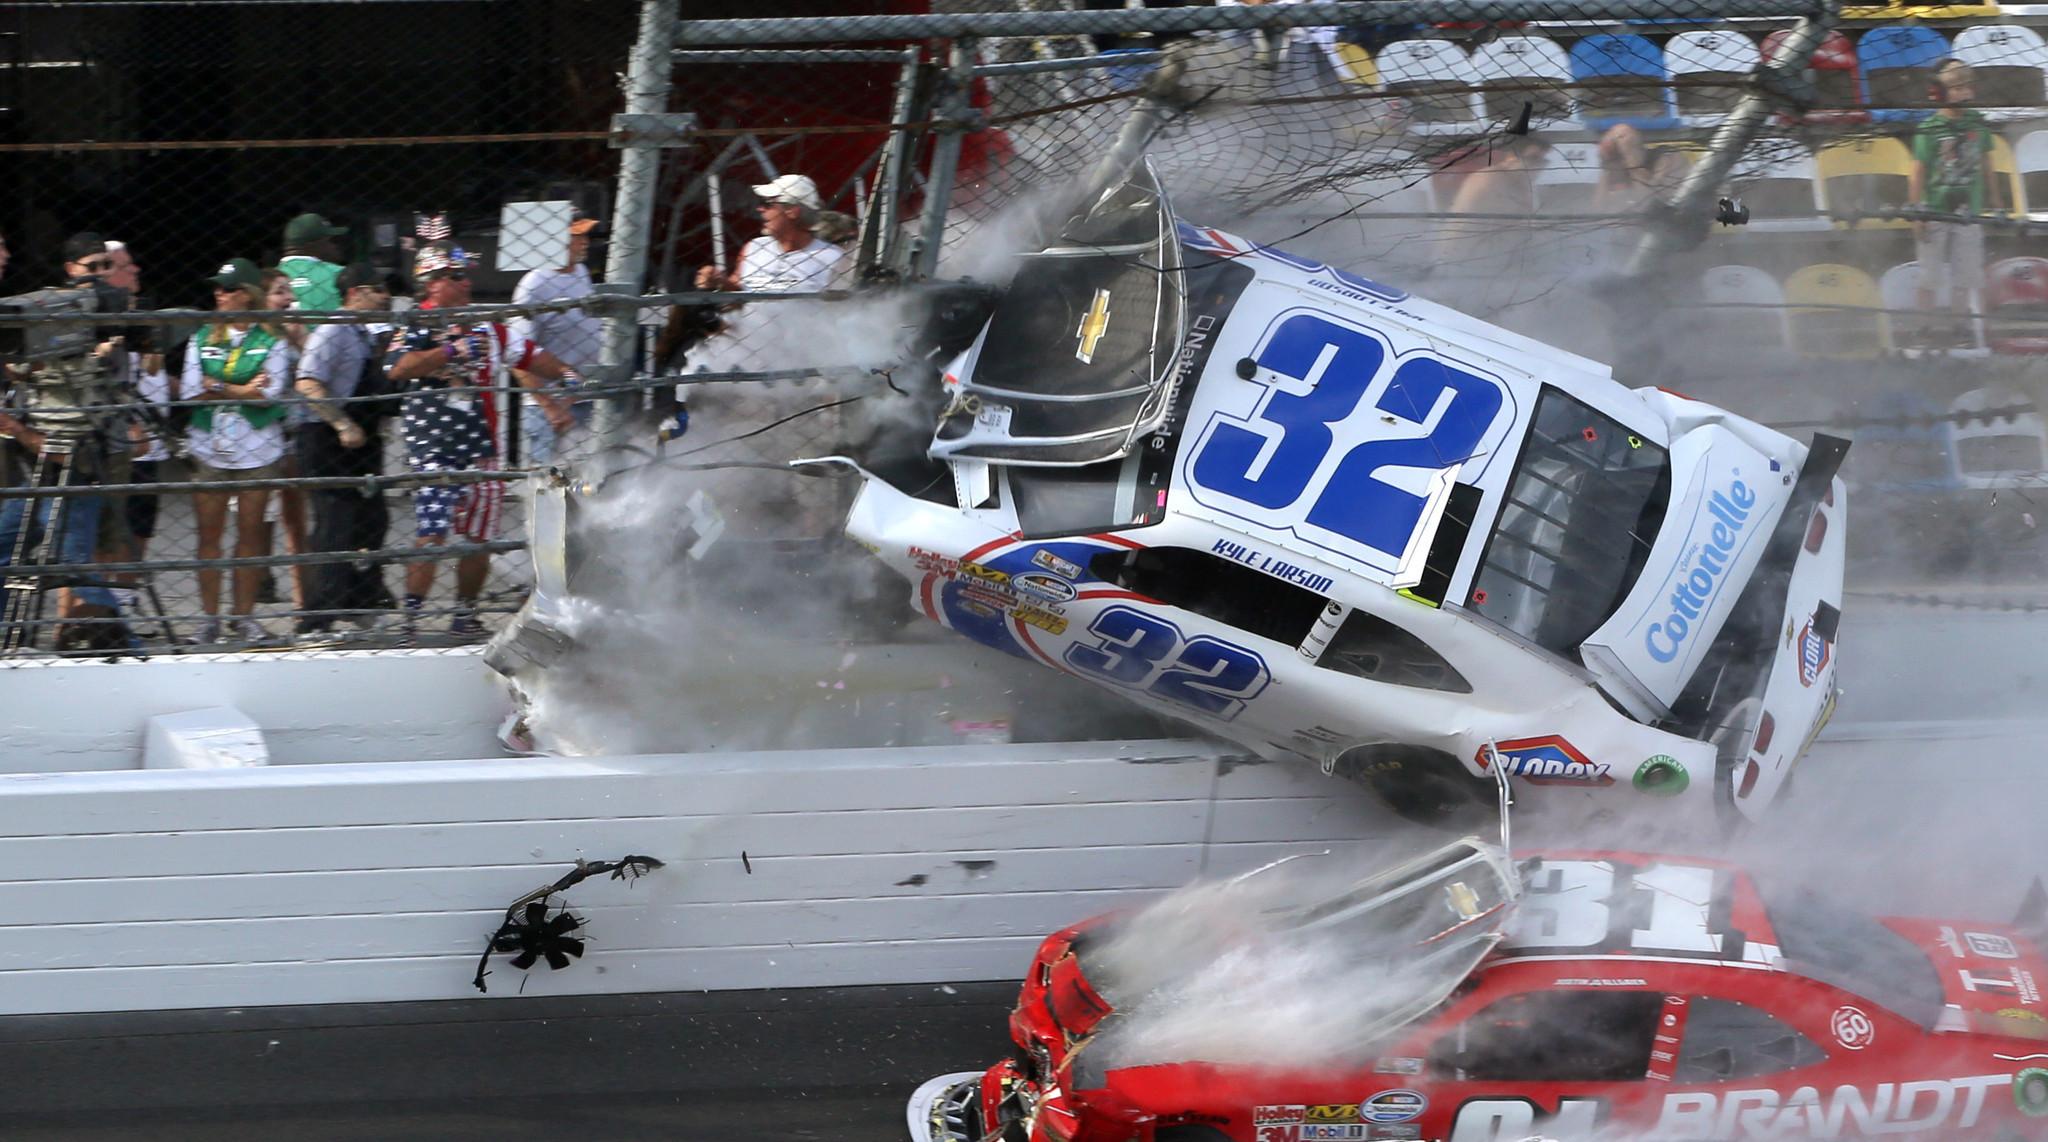 Sports Car Racing Crashes